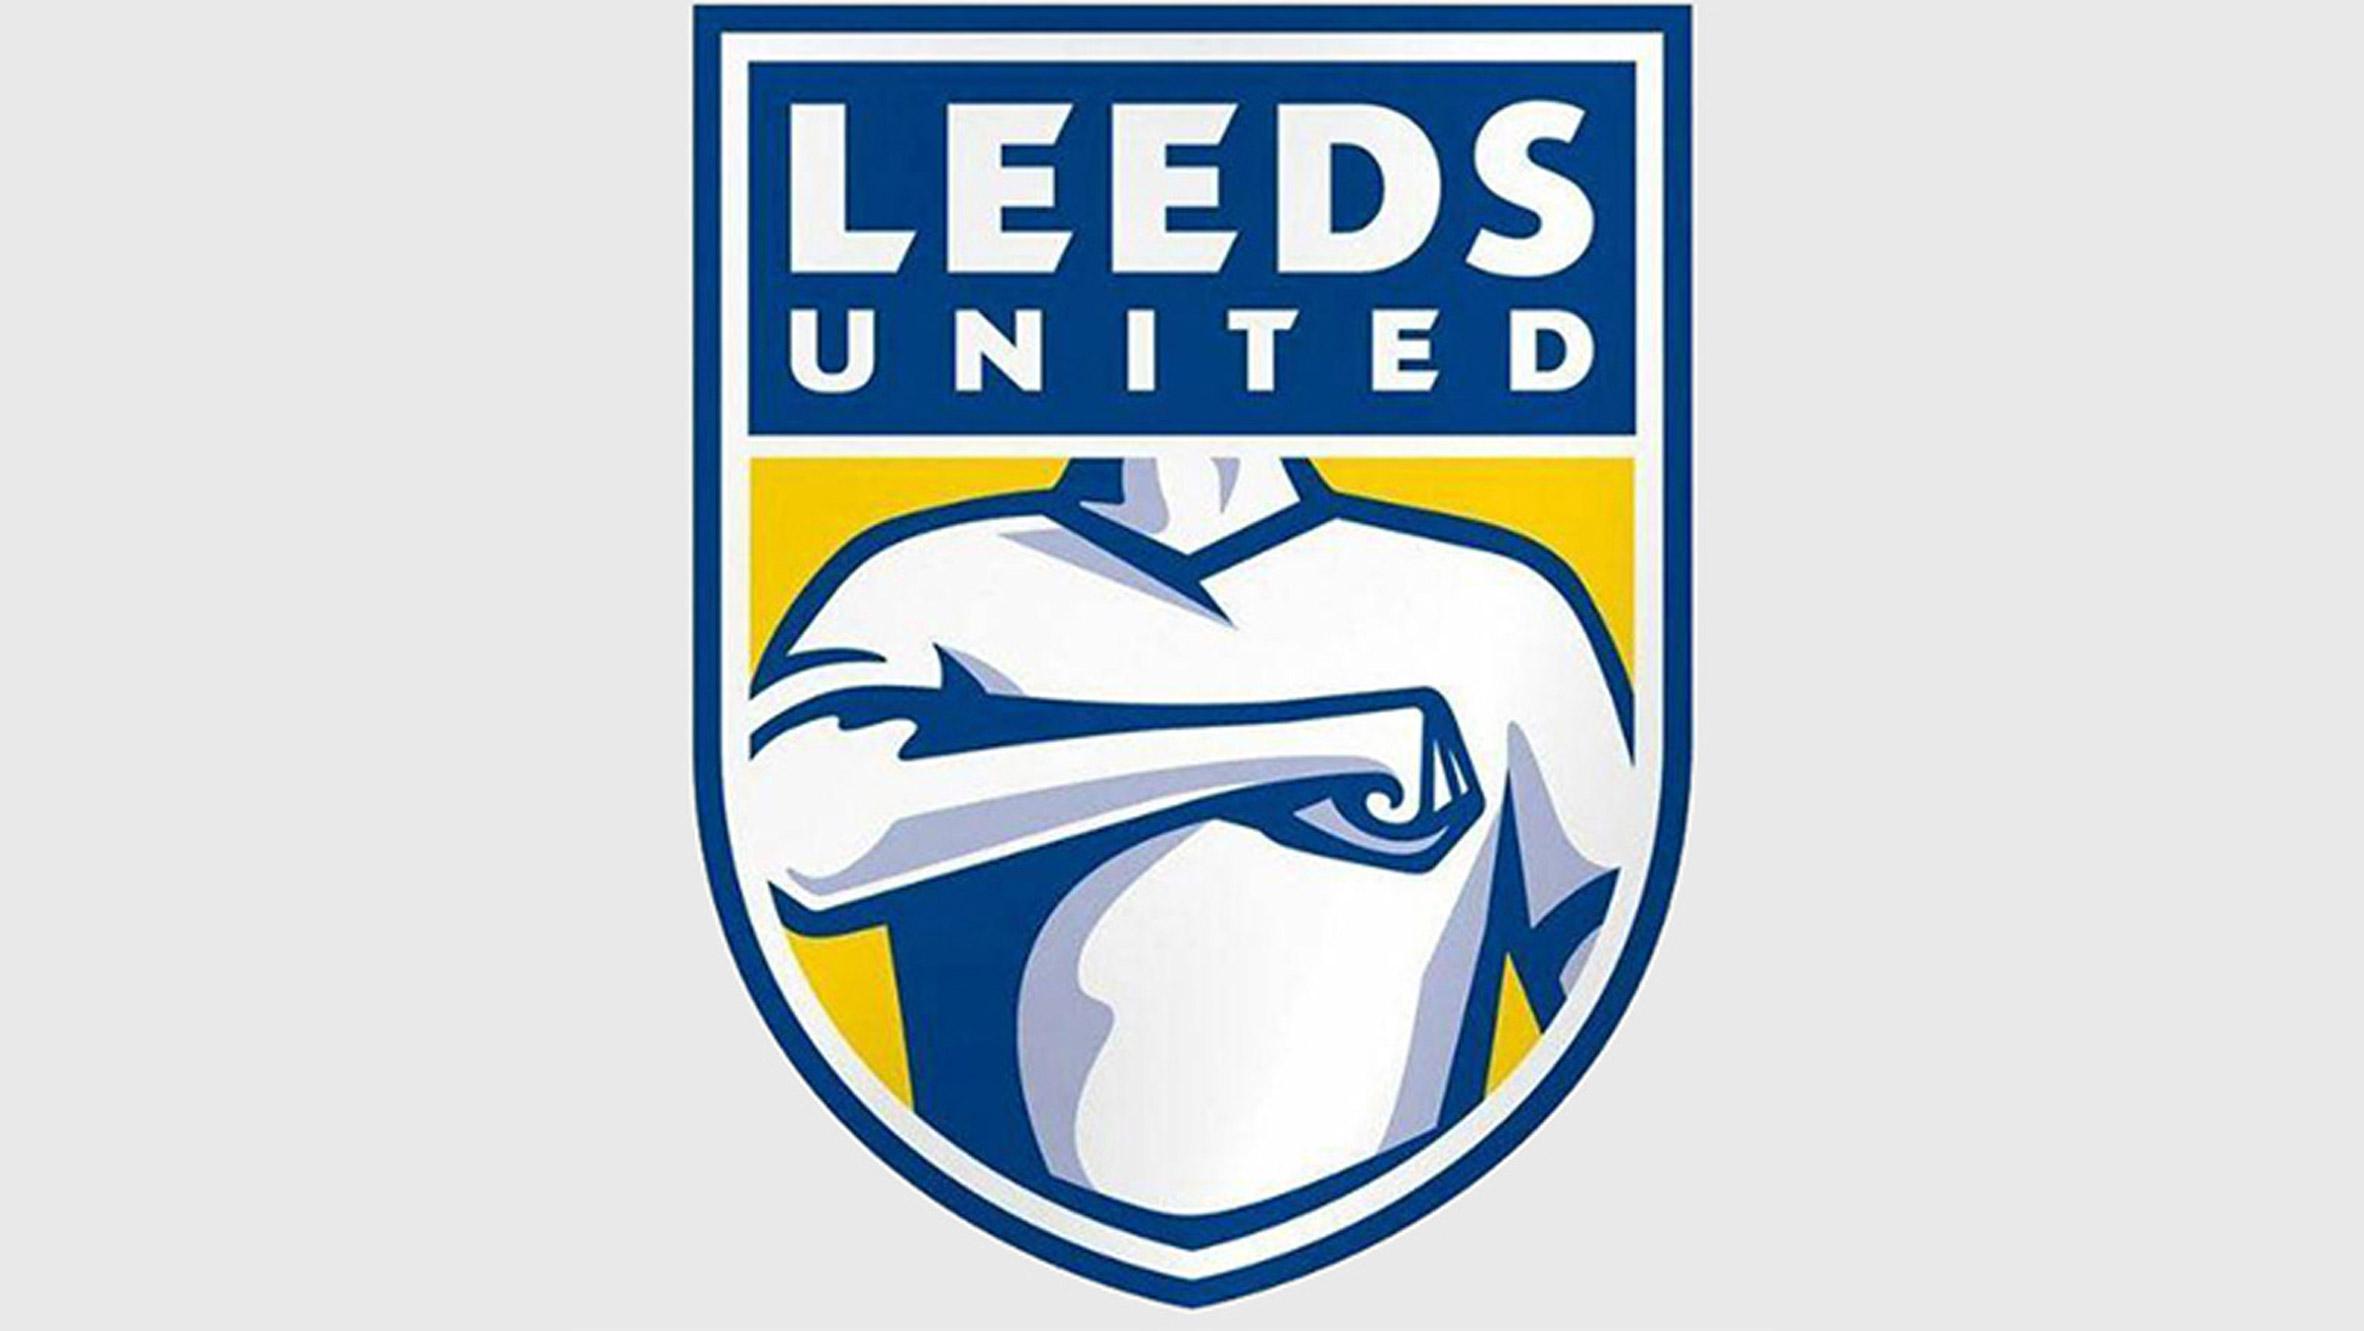 What will Rodrigo bring to Leeds United?